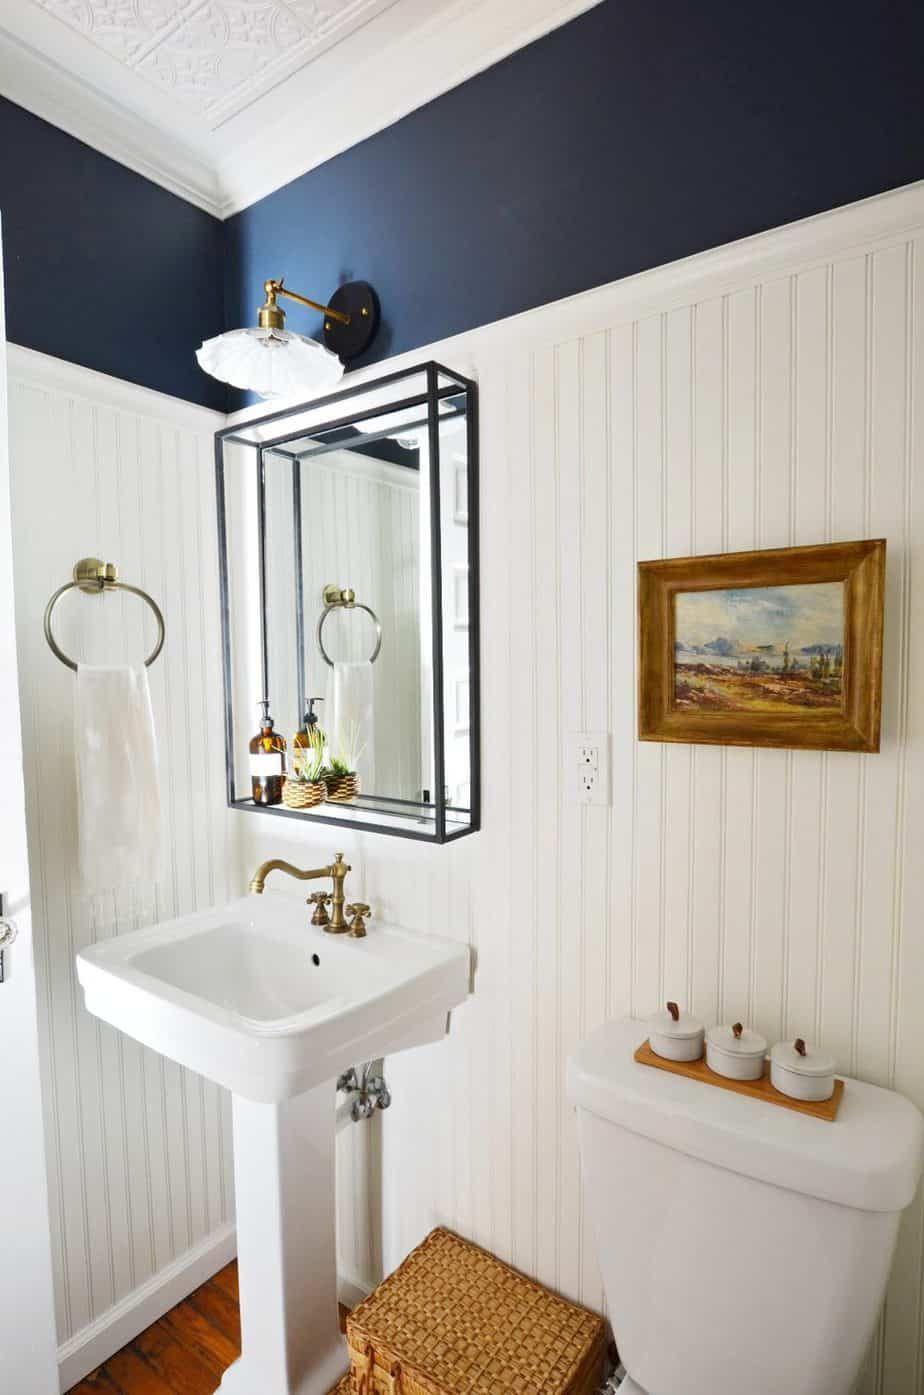 Room Reveal Our Vintage Modern Powder Room Remodel Bathroom